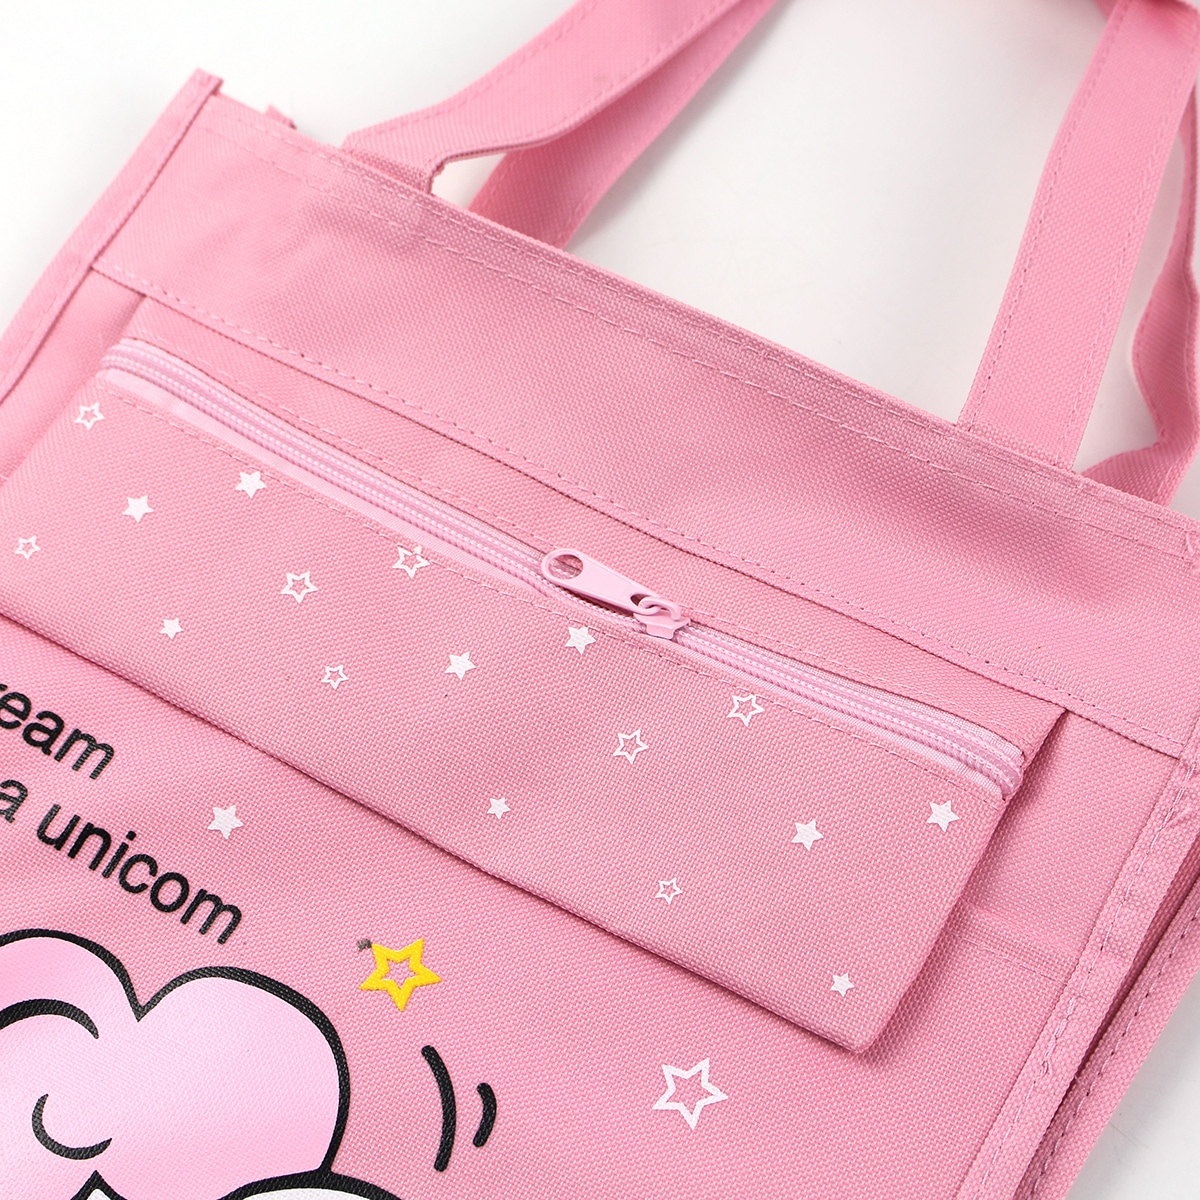 Girls Cartoon Graphic Tote Bag